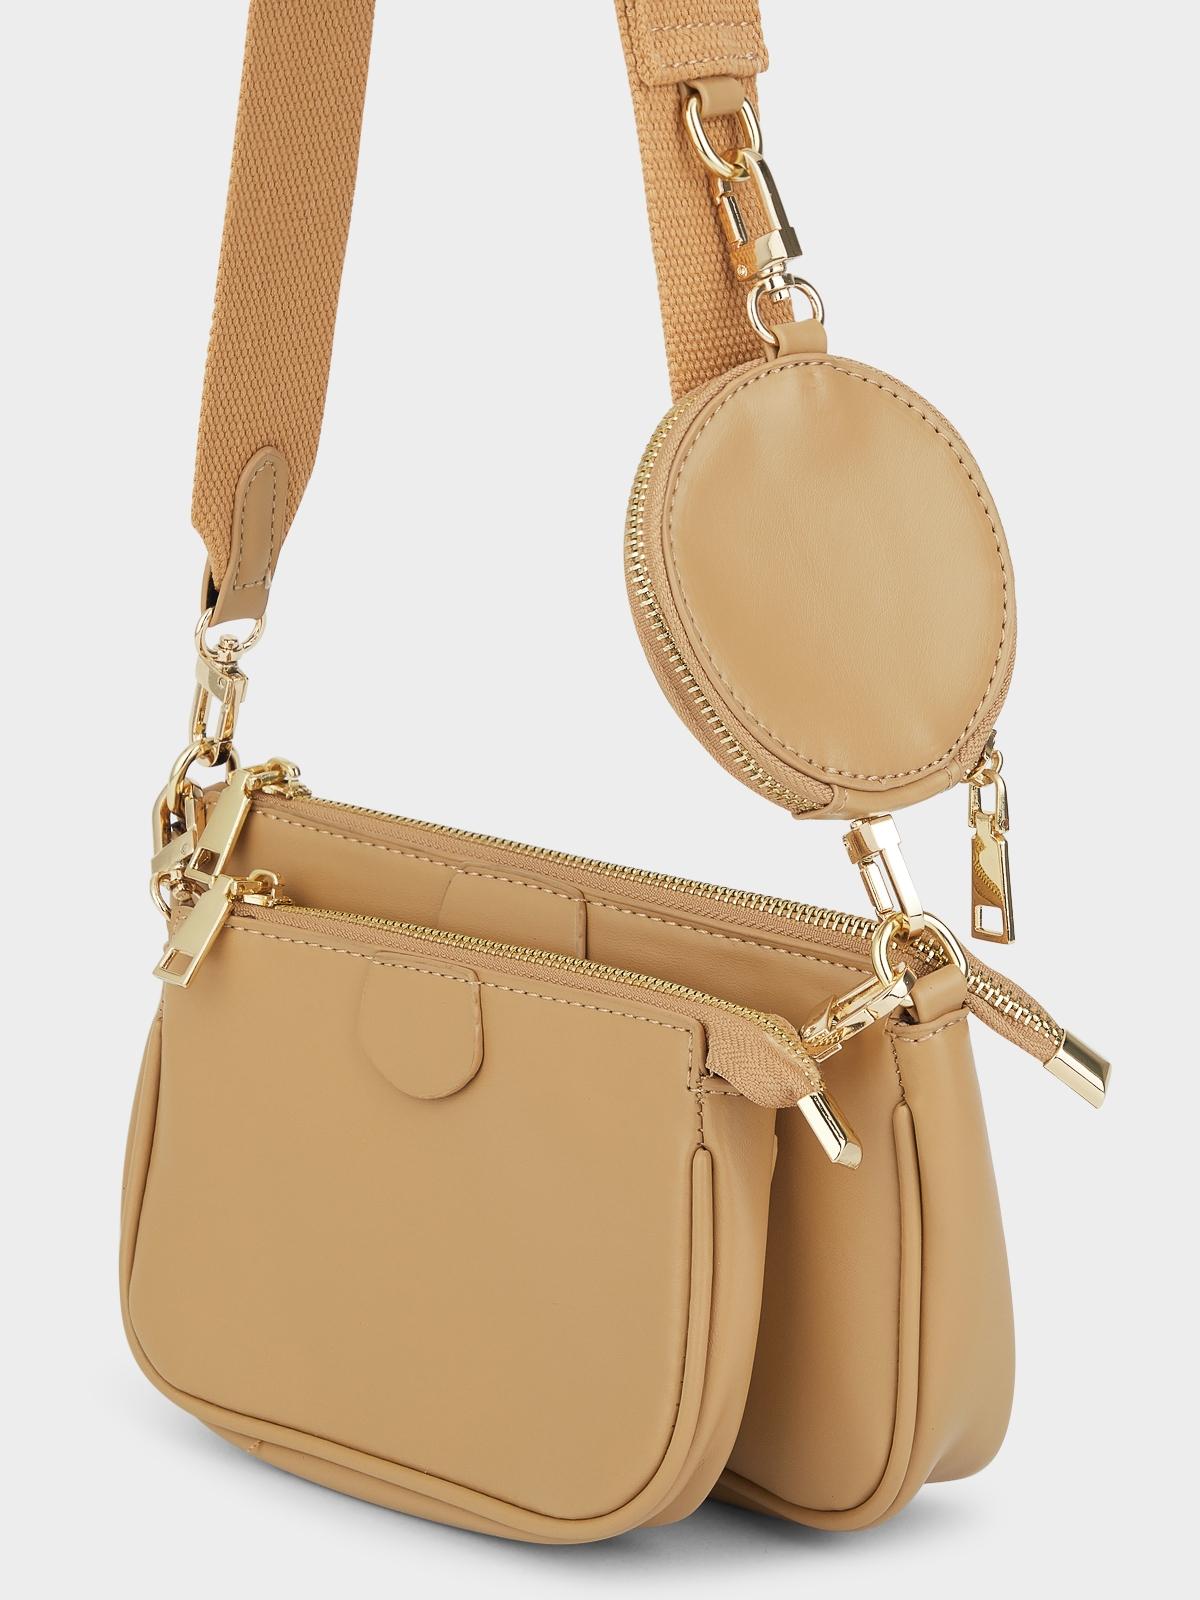 Three Size Crossbody Bag Beige